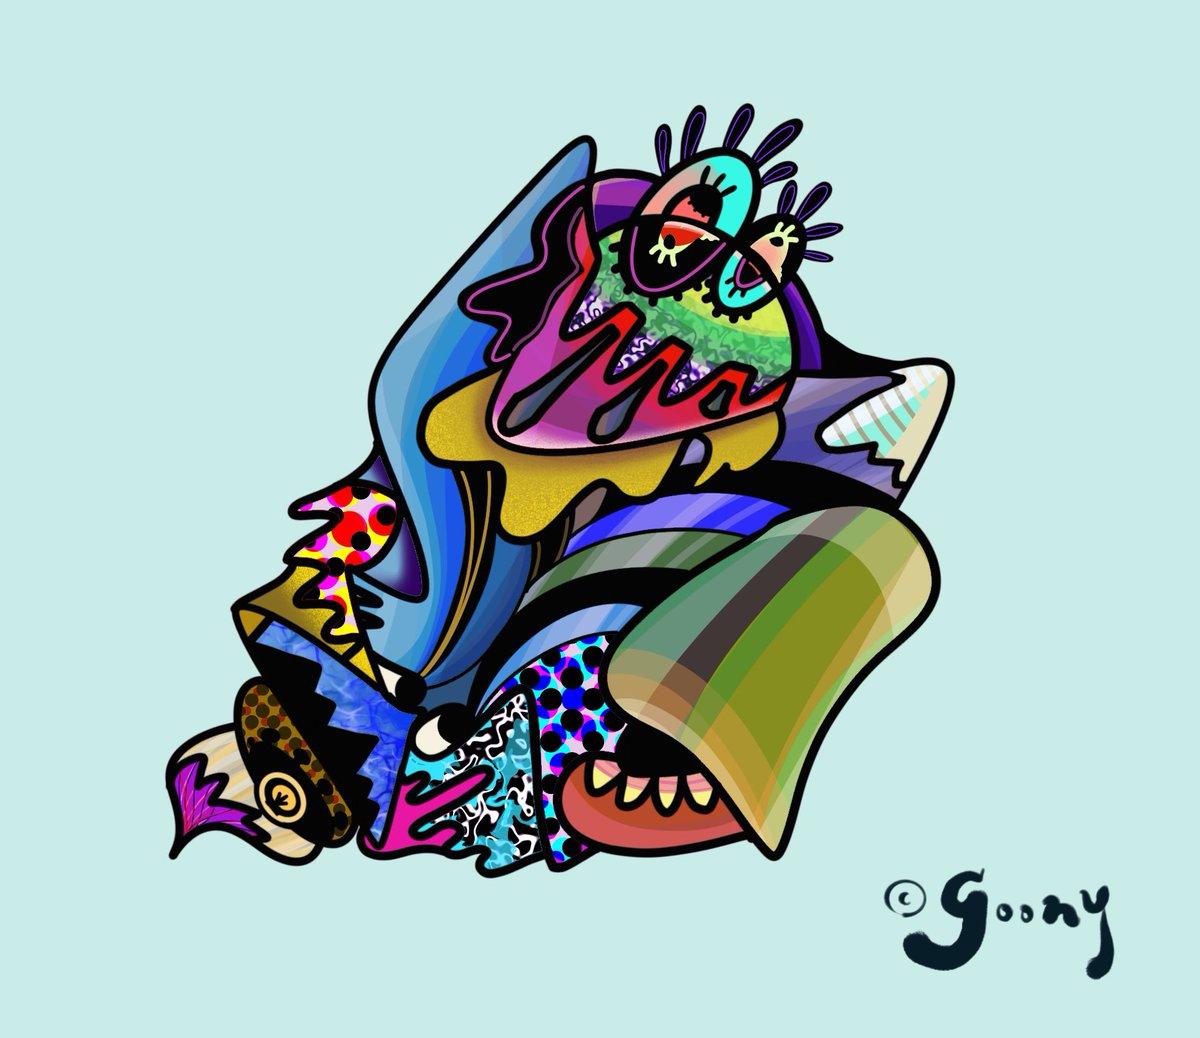 #digitaldrawing #drawing #doodle #picture #painting #sketch #illustration #digitalart #art #arte #artwork  #popart  #color #artgallery #originalart #ipadproart #design #lowbrowart #graphic #vexx  #アート #デザイン #イラスト